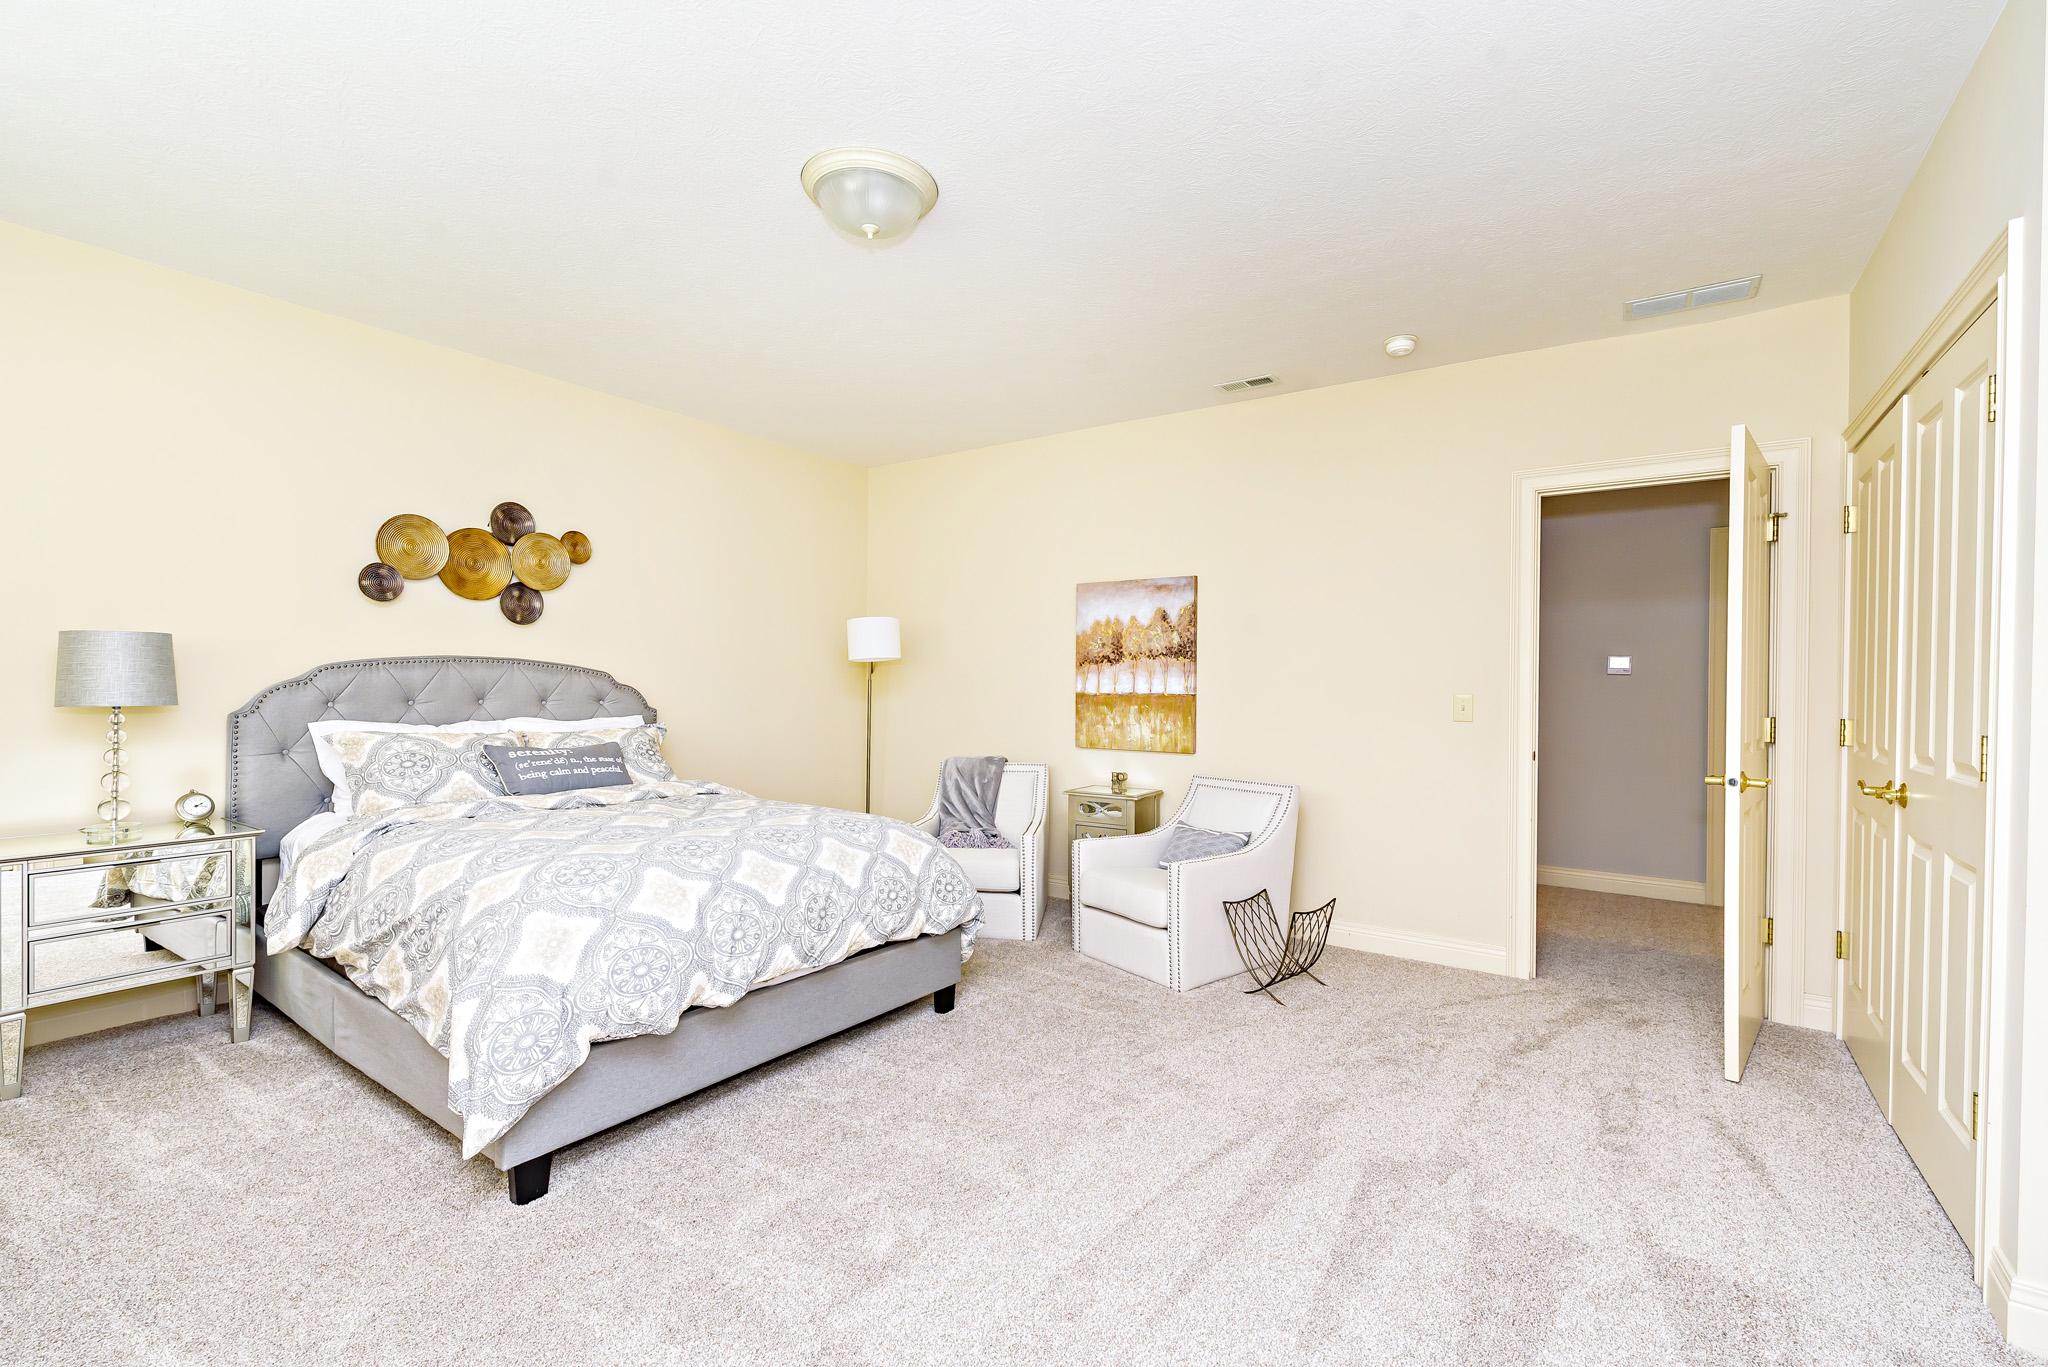 41_Bedroom 5.jpg